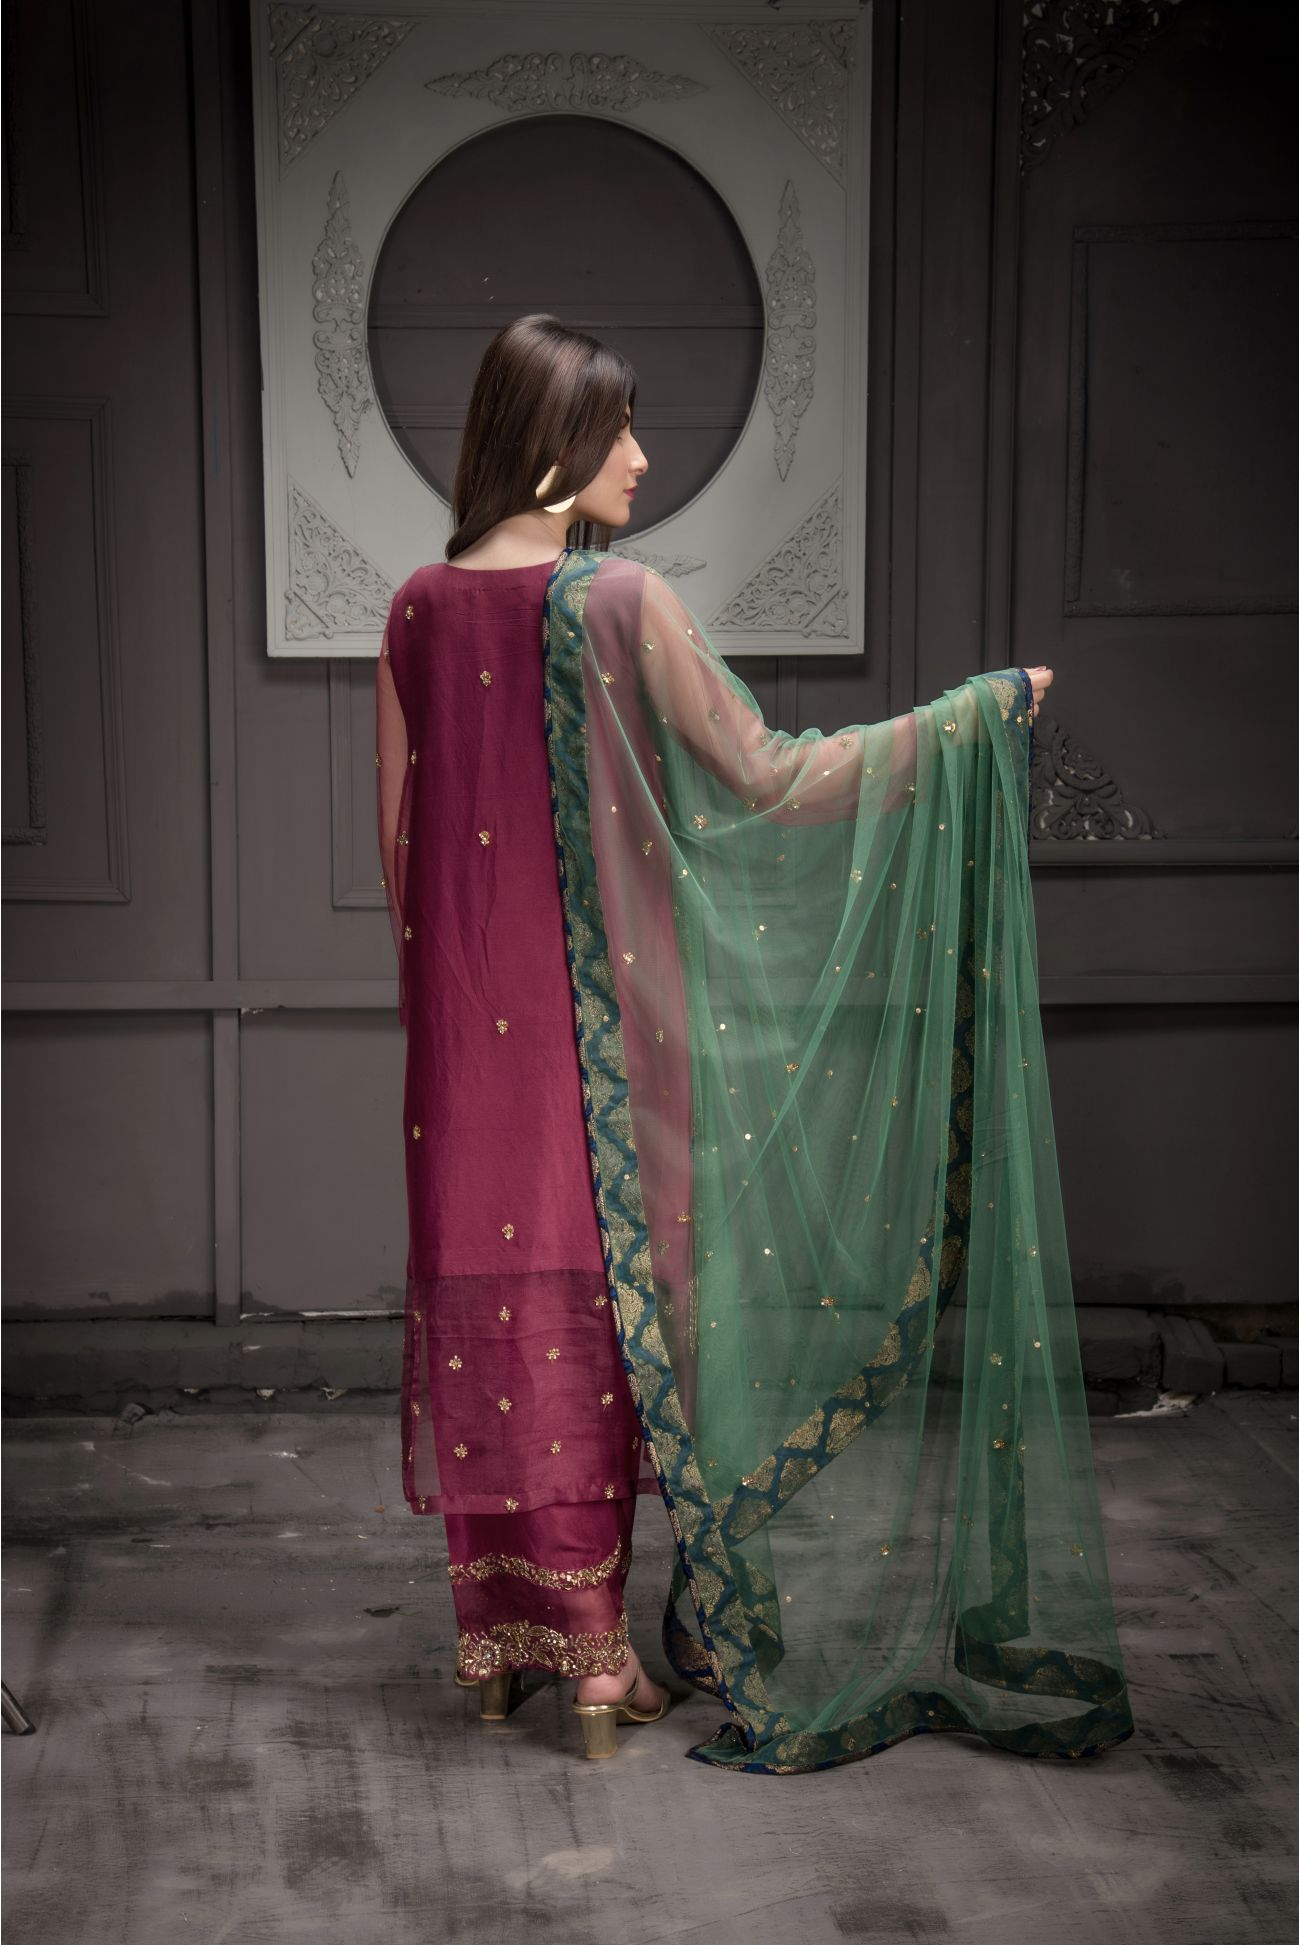 Buy Exclusive Malaga Bridal Wear – Aqbd12 Online In USA, Uk & Pakistan - 03